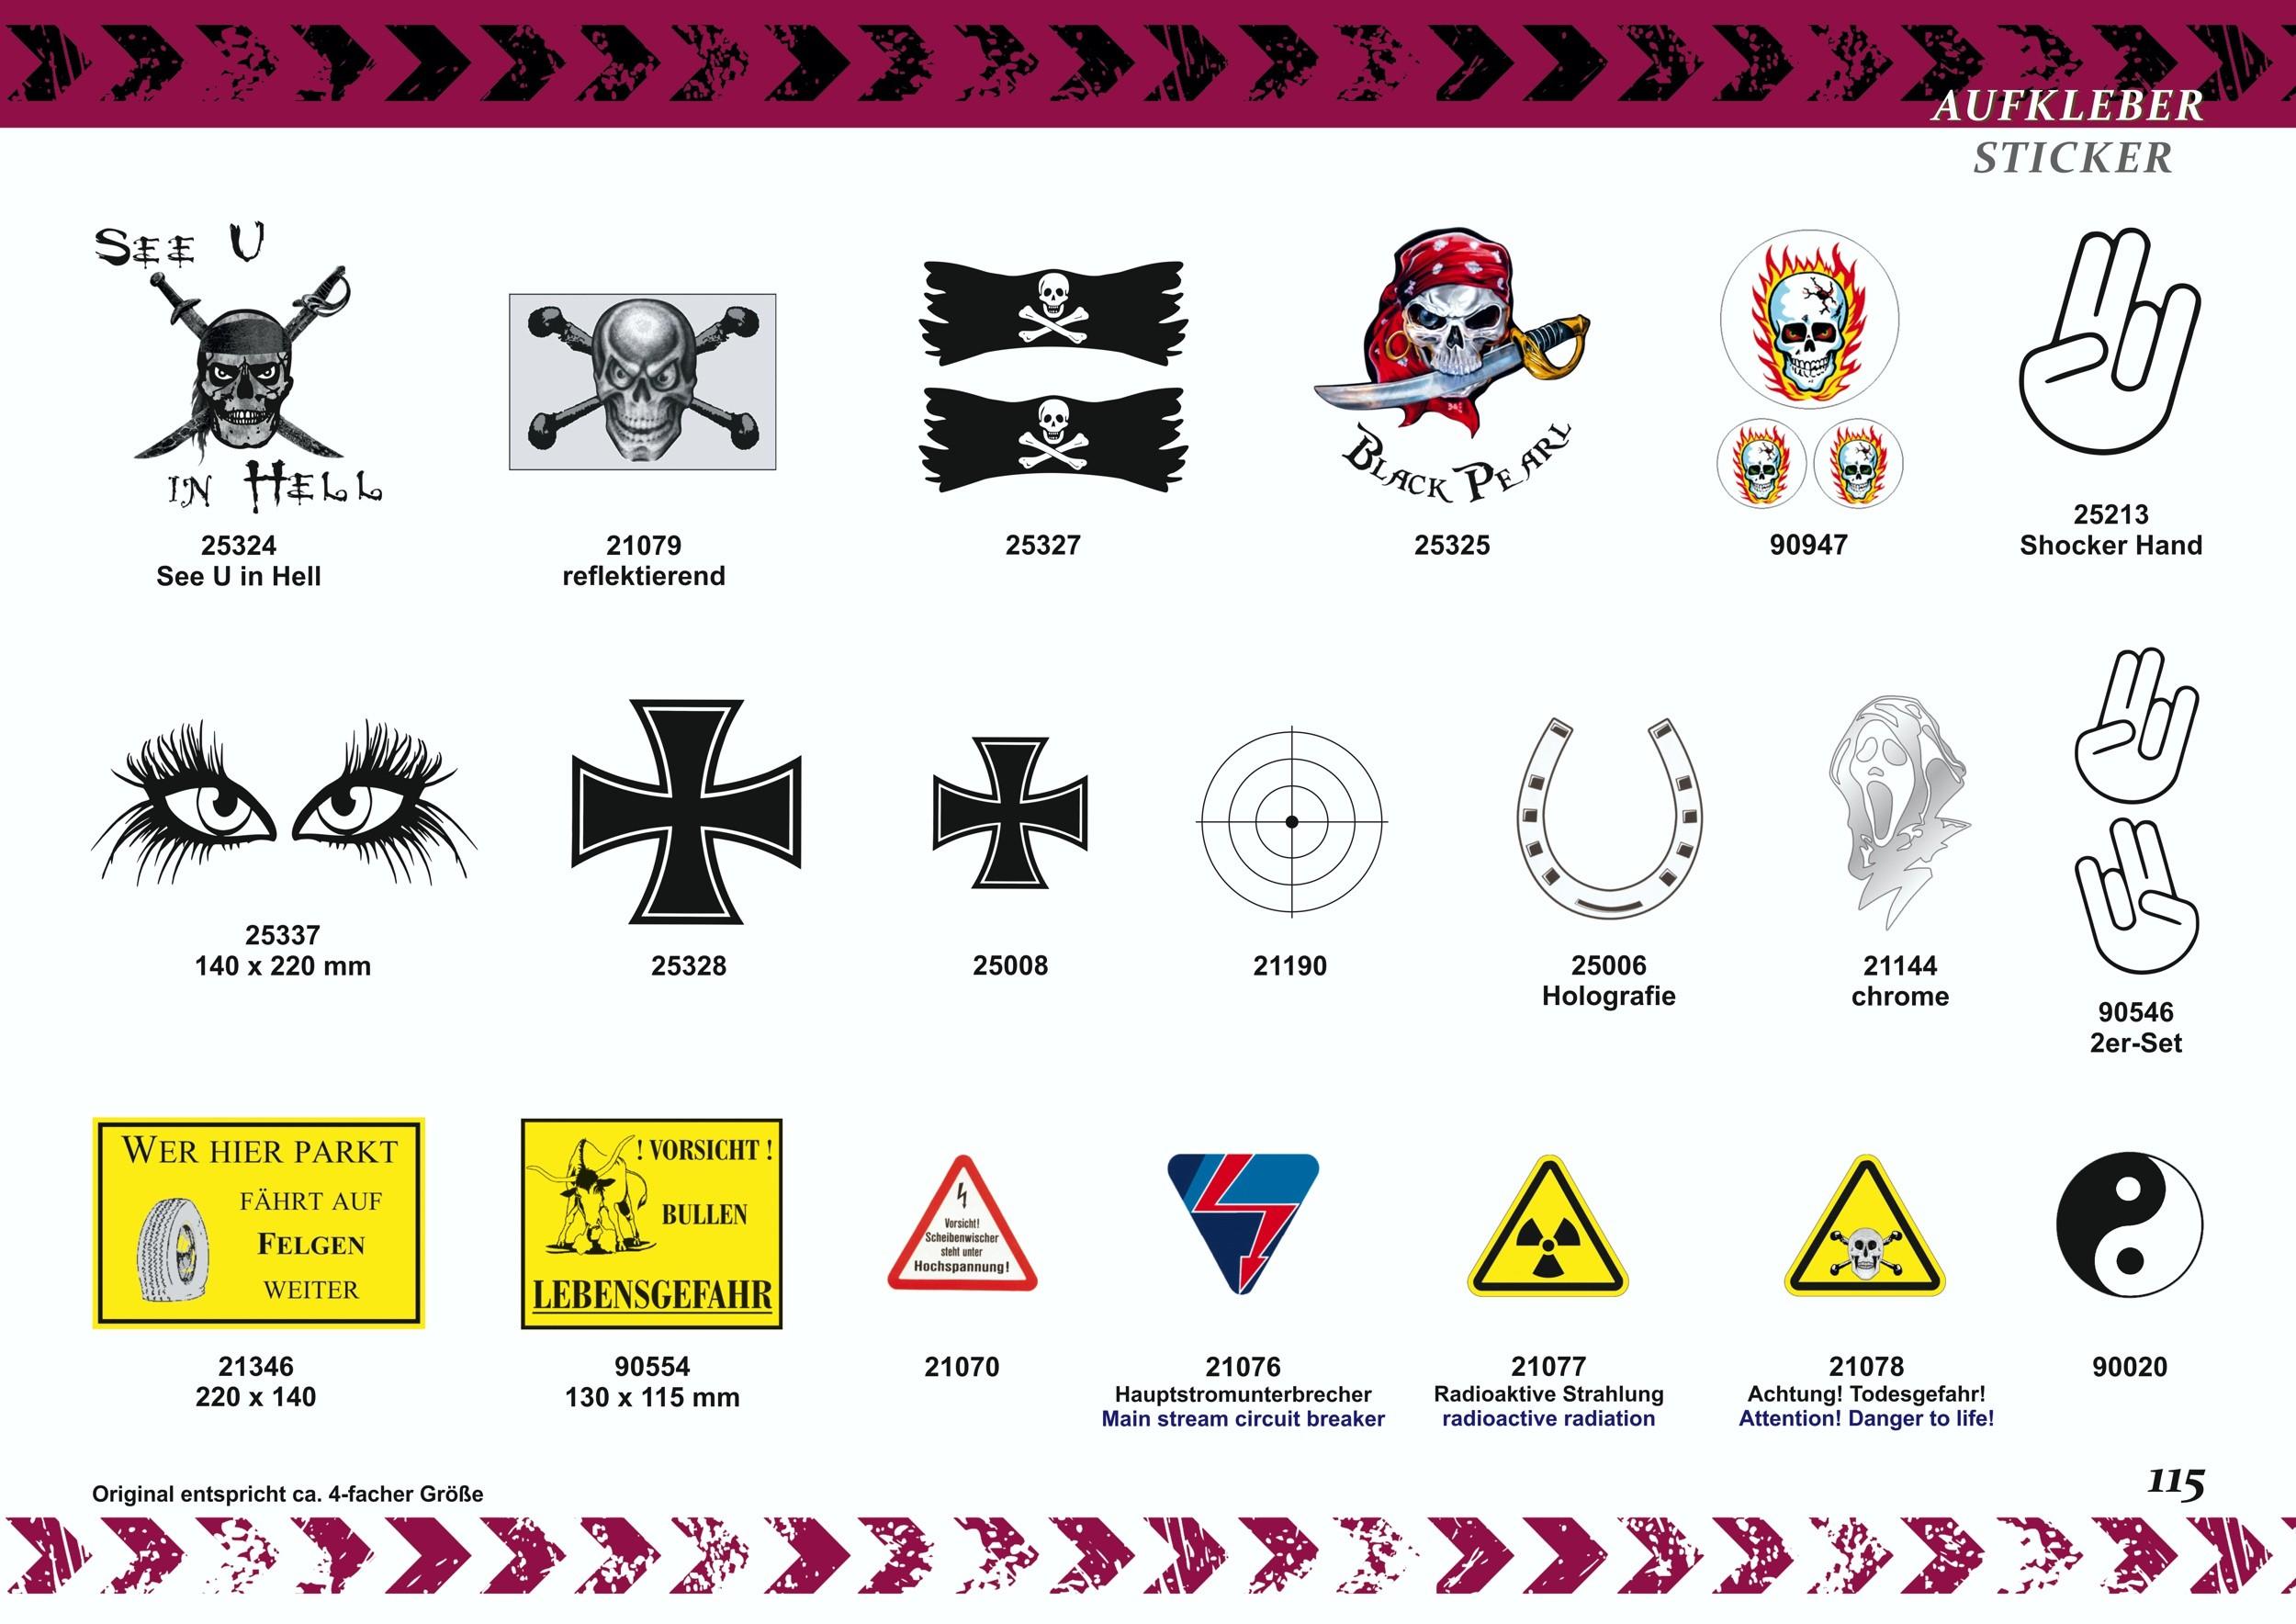 Sticker Auto-Alarm interiorsticking – Bild 8